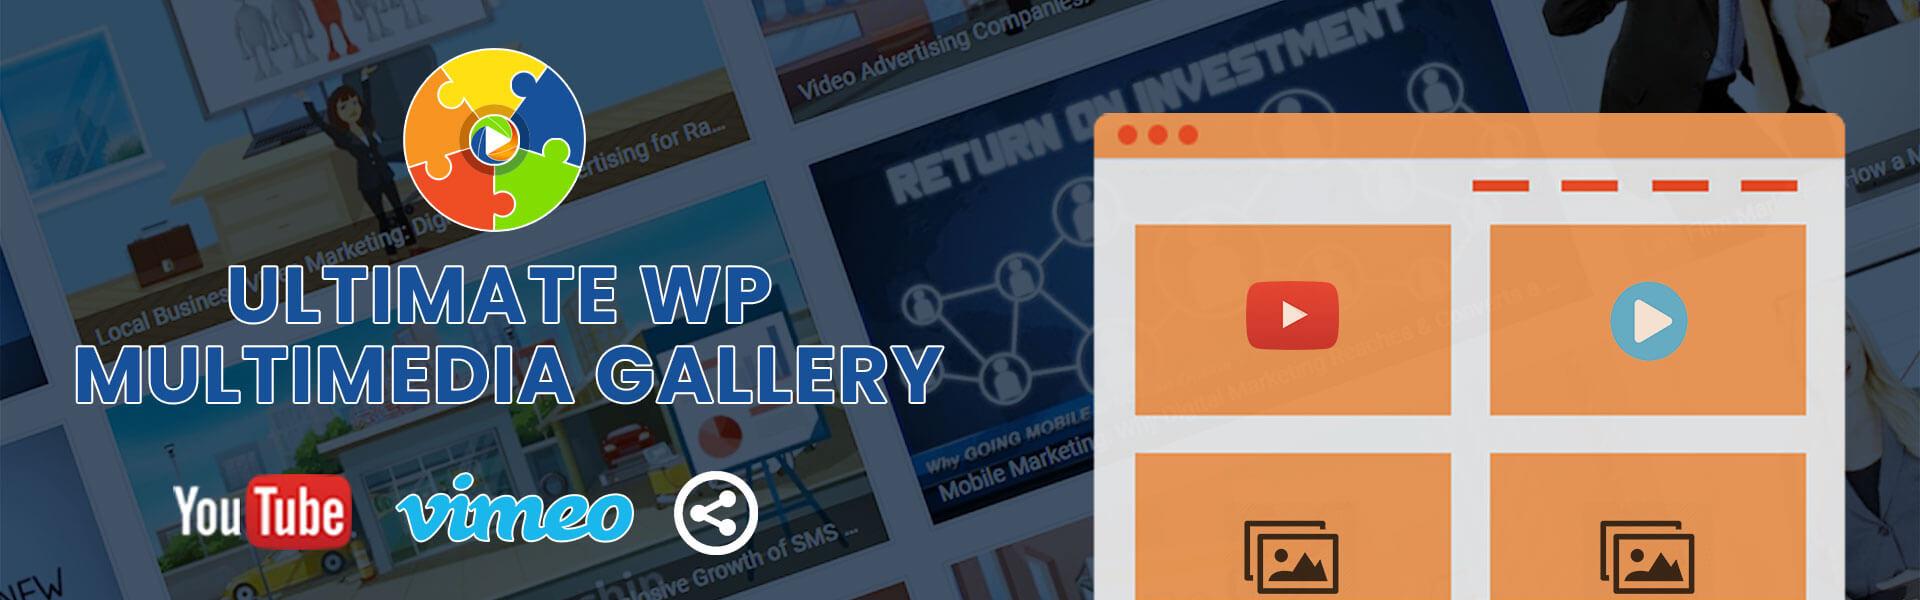 Ultimate WP Multimedia Gallery Banner